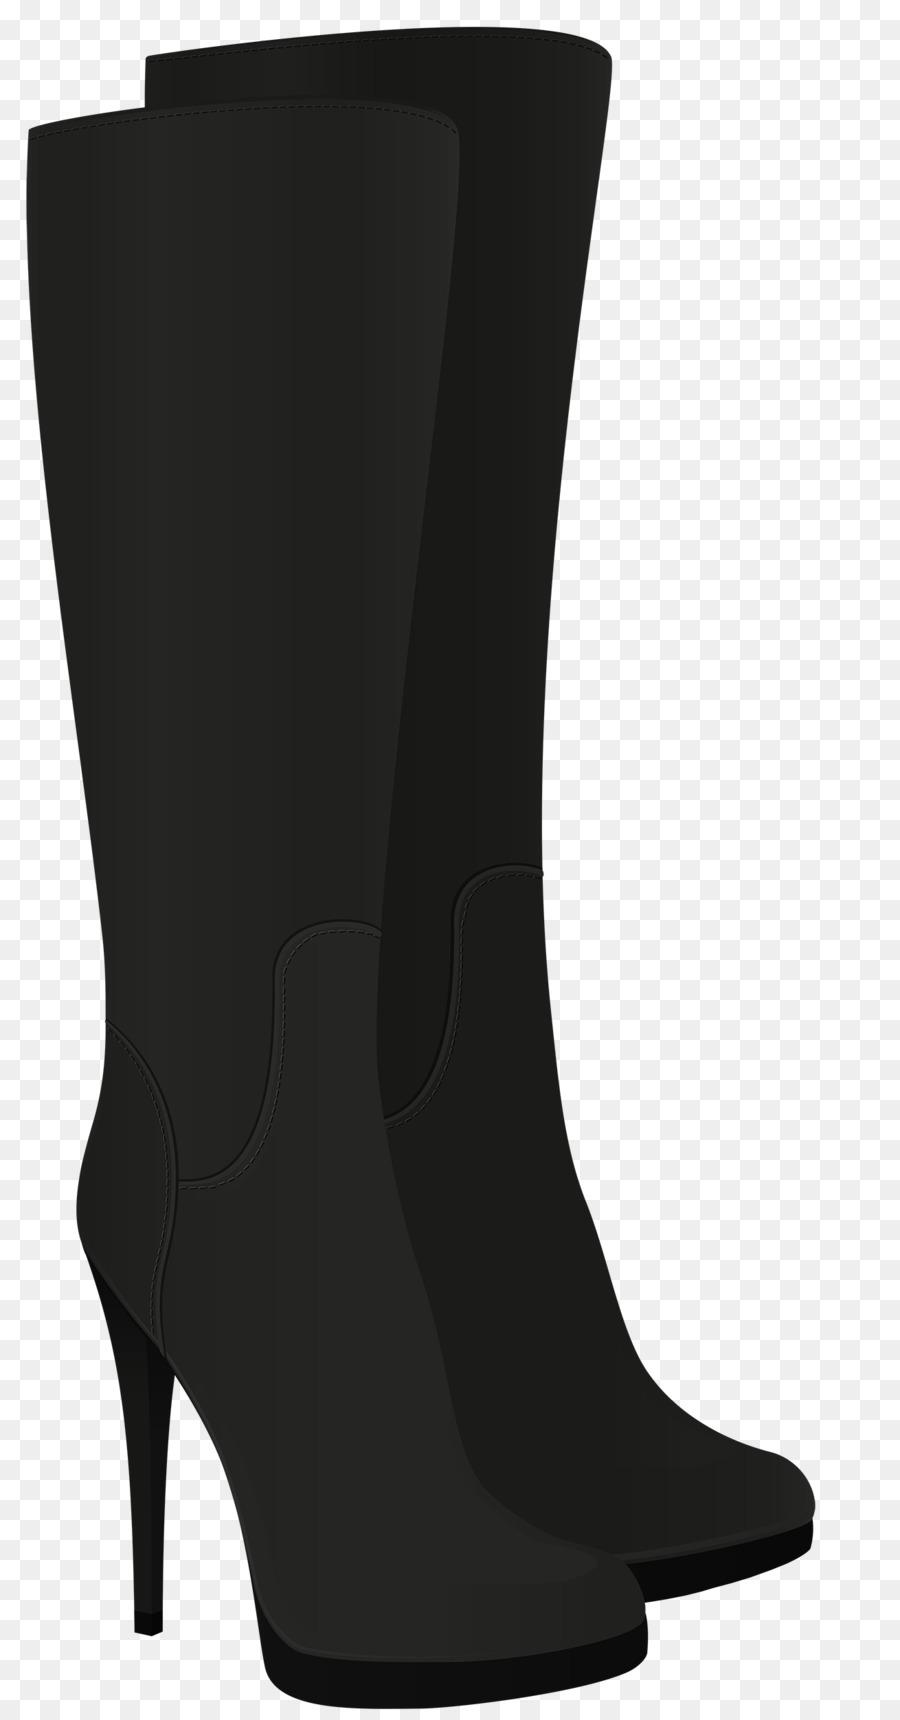 Clip art clipart Boot Shoe Clip art